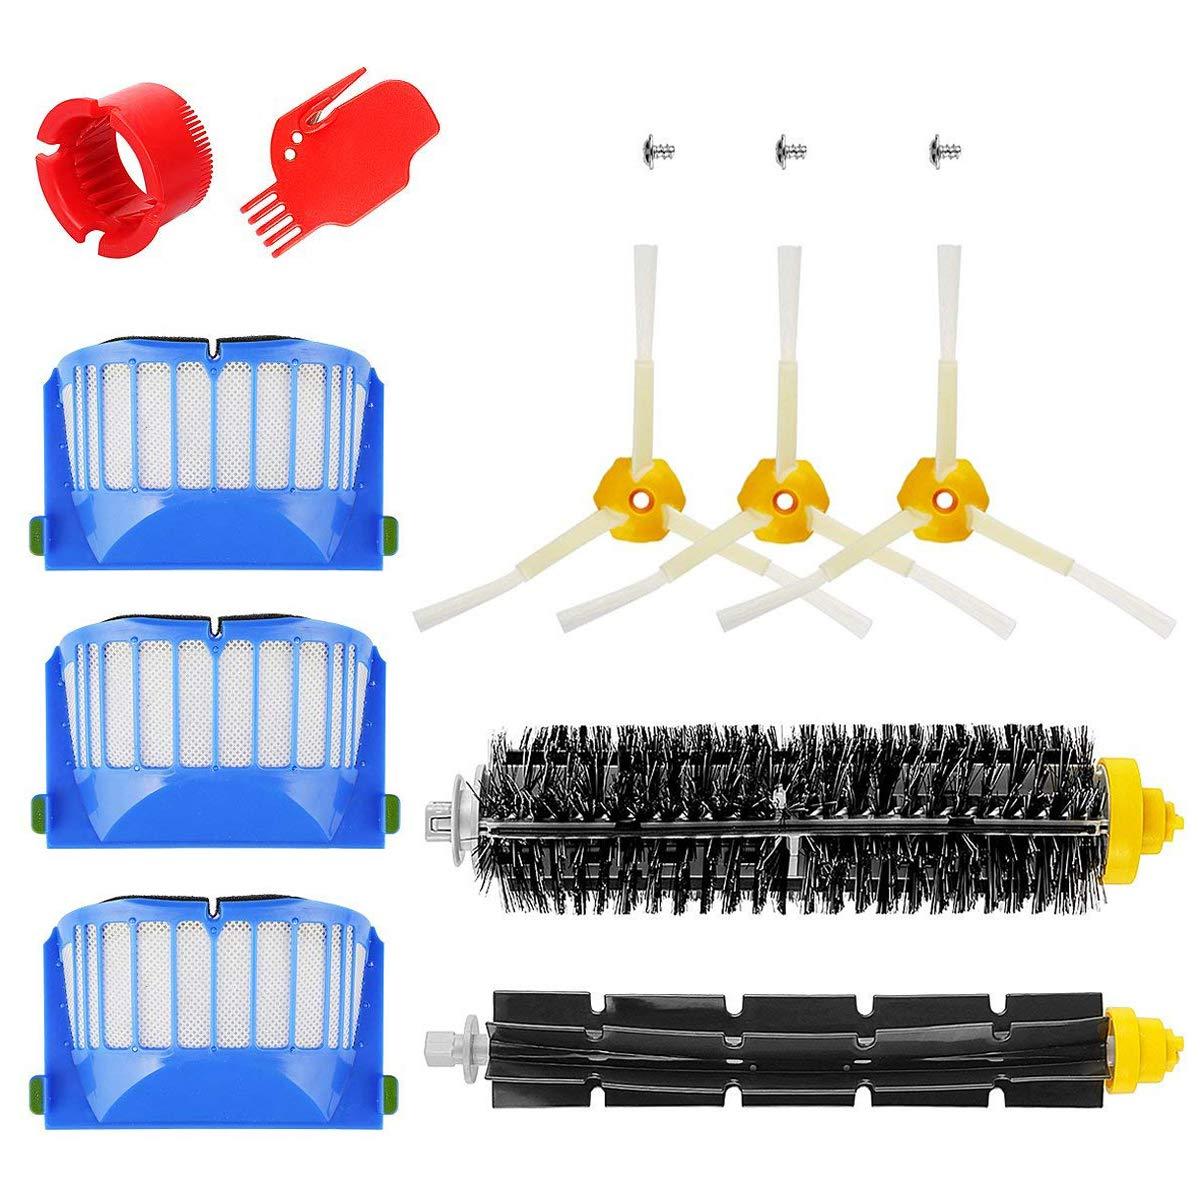 iRobot Roomba Serie 600 Pack Kit Cepillos Repuestos de Accesorios para Aspiradoras 10PCS 600 Series 605 610 615 616 620 625 630 631 632 639 650 651 660 670 ...